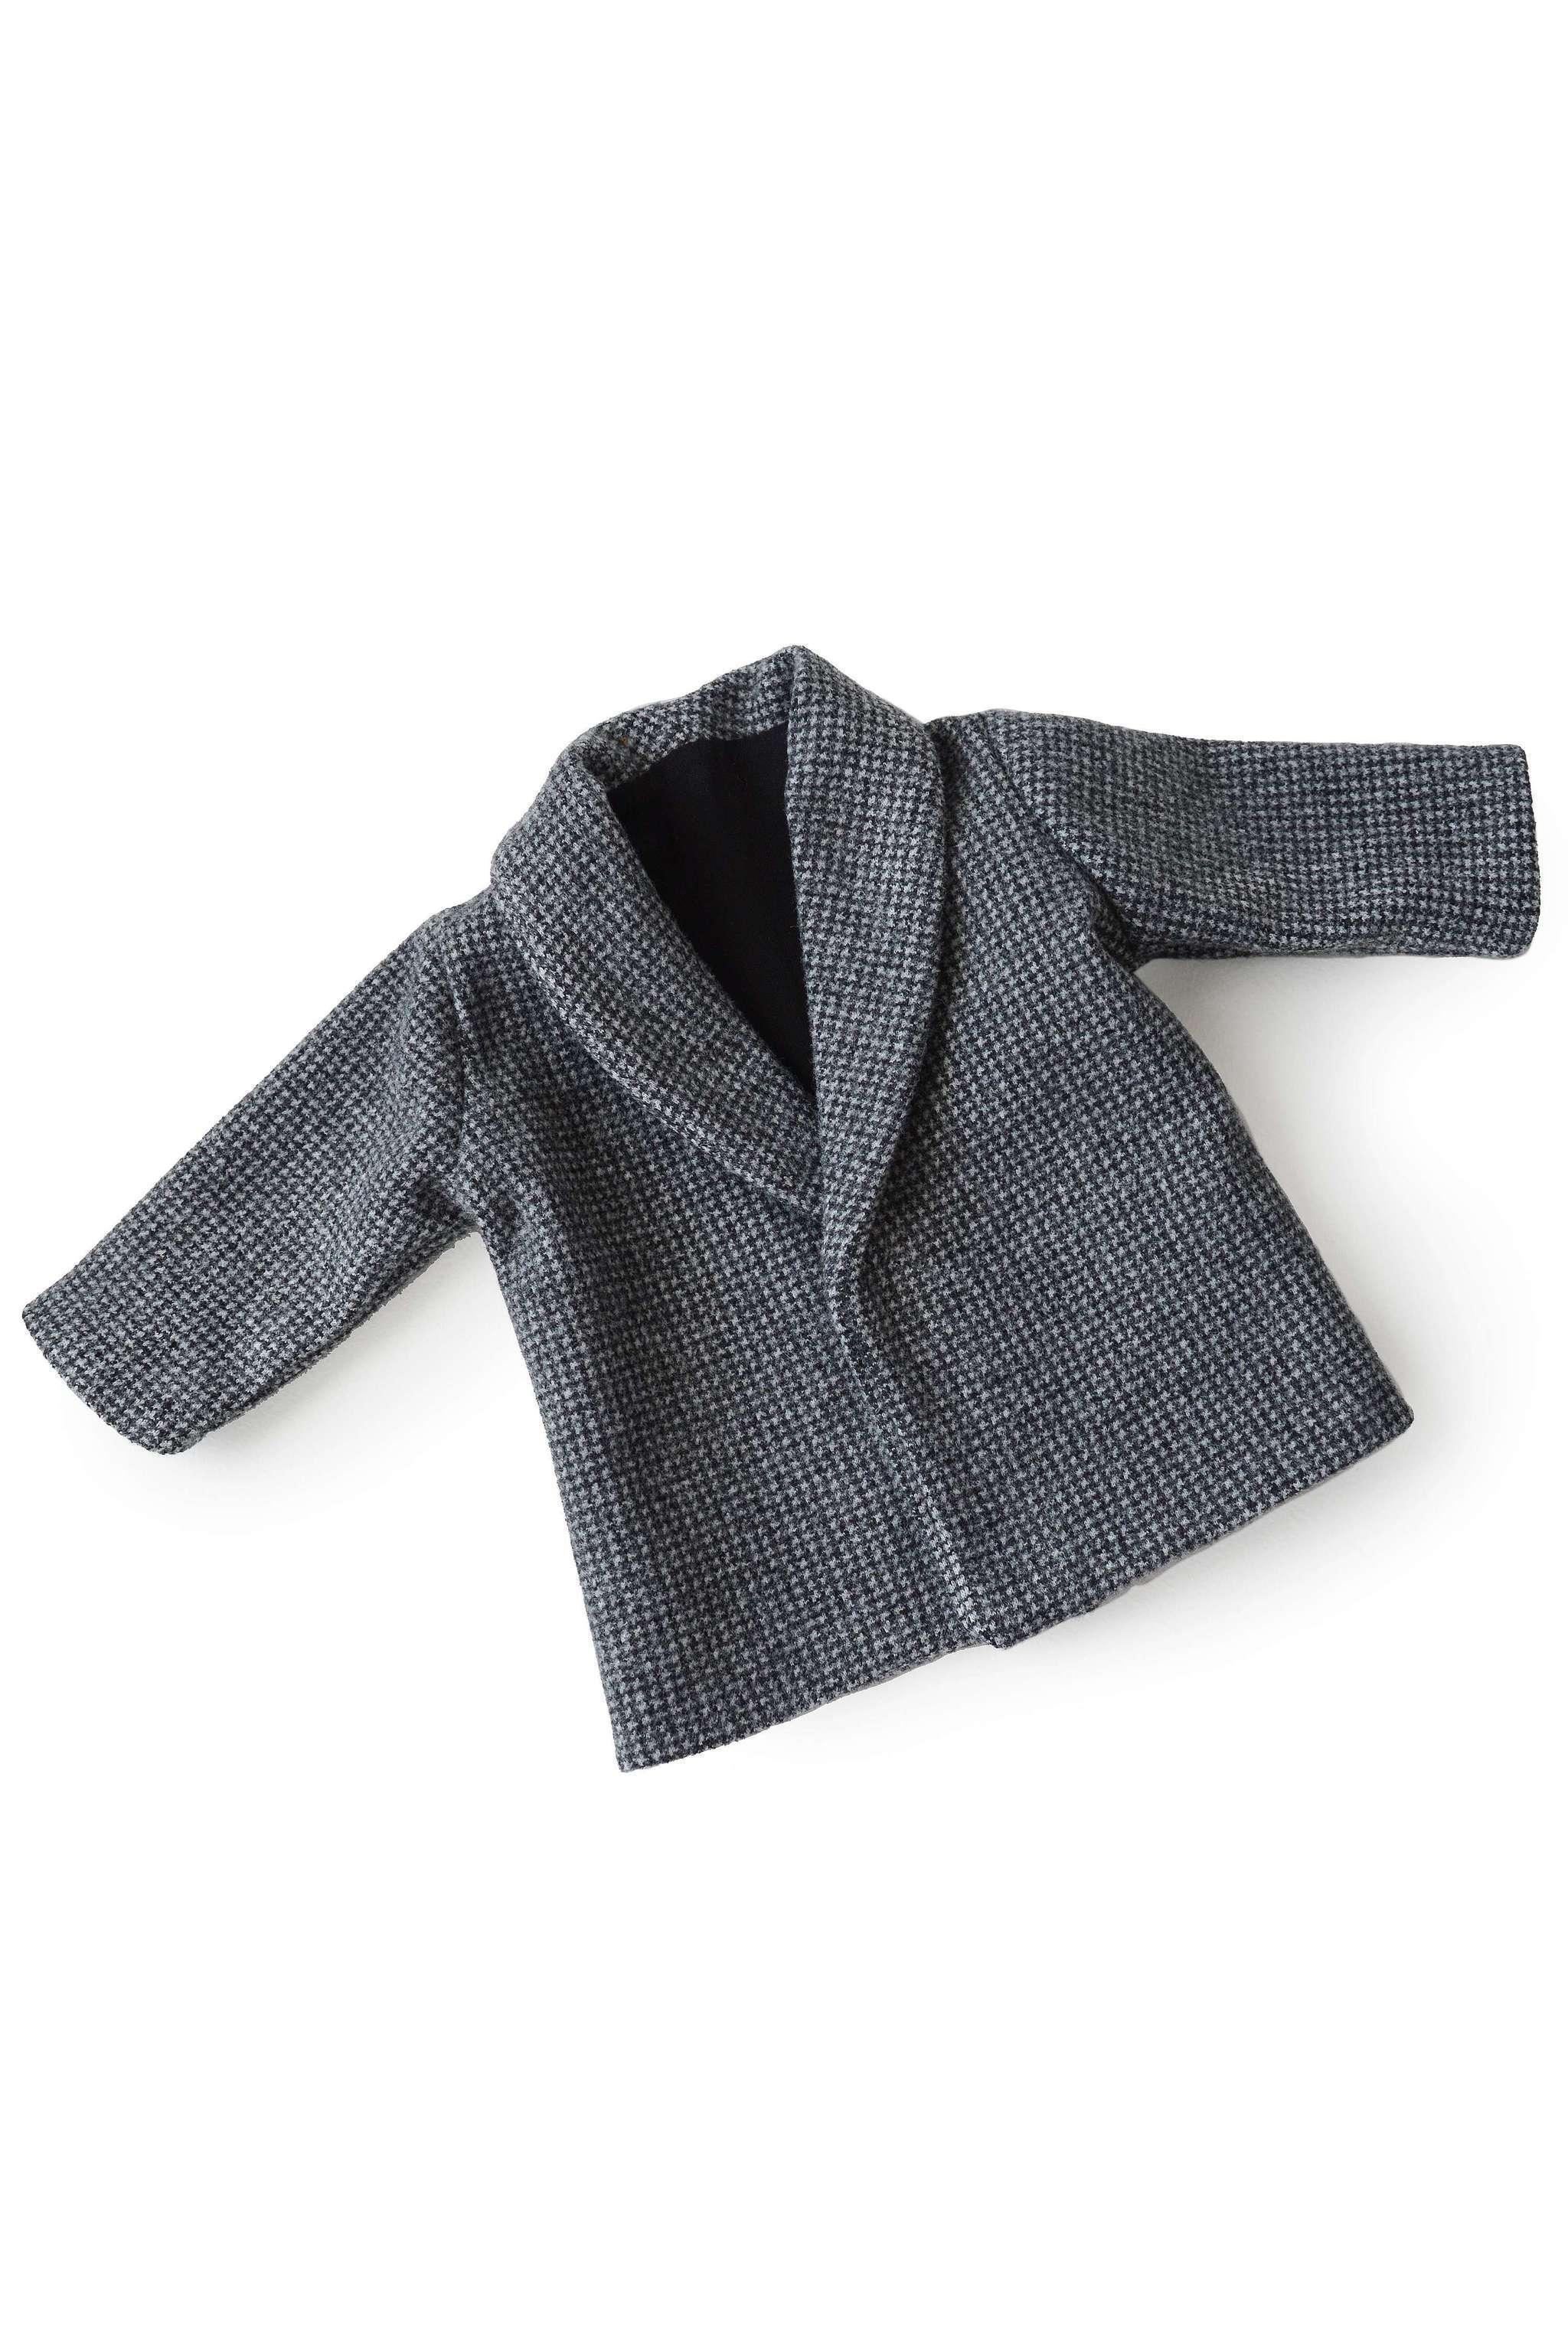 Andrews coat (Philomena Kloss bamse)